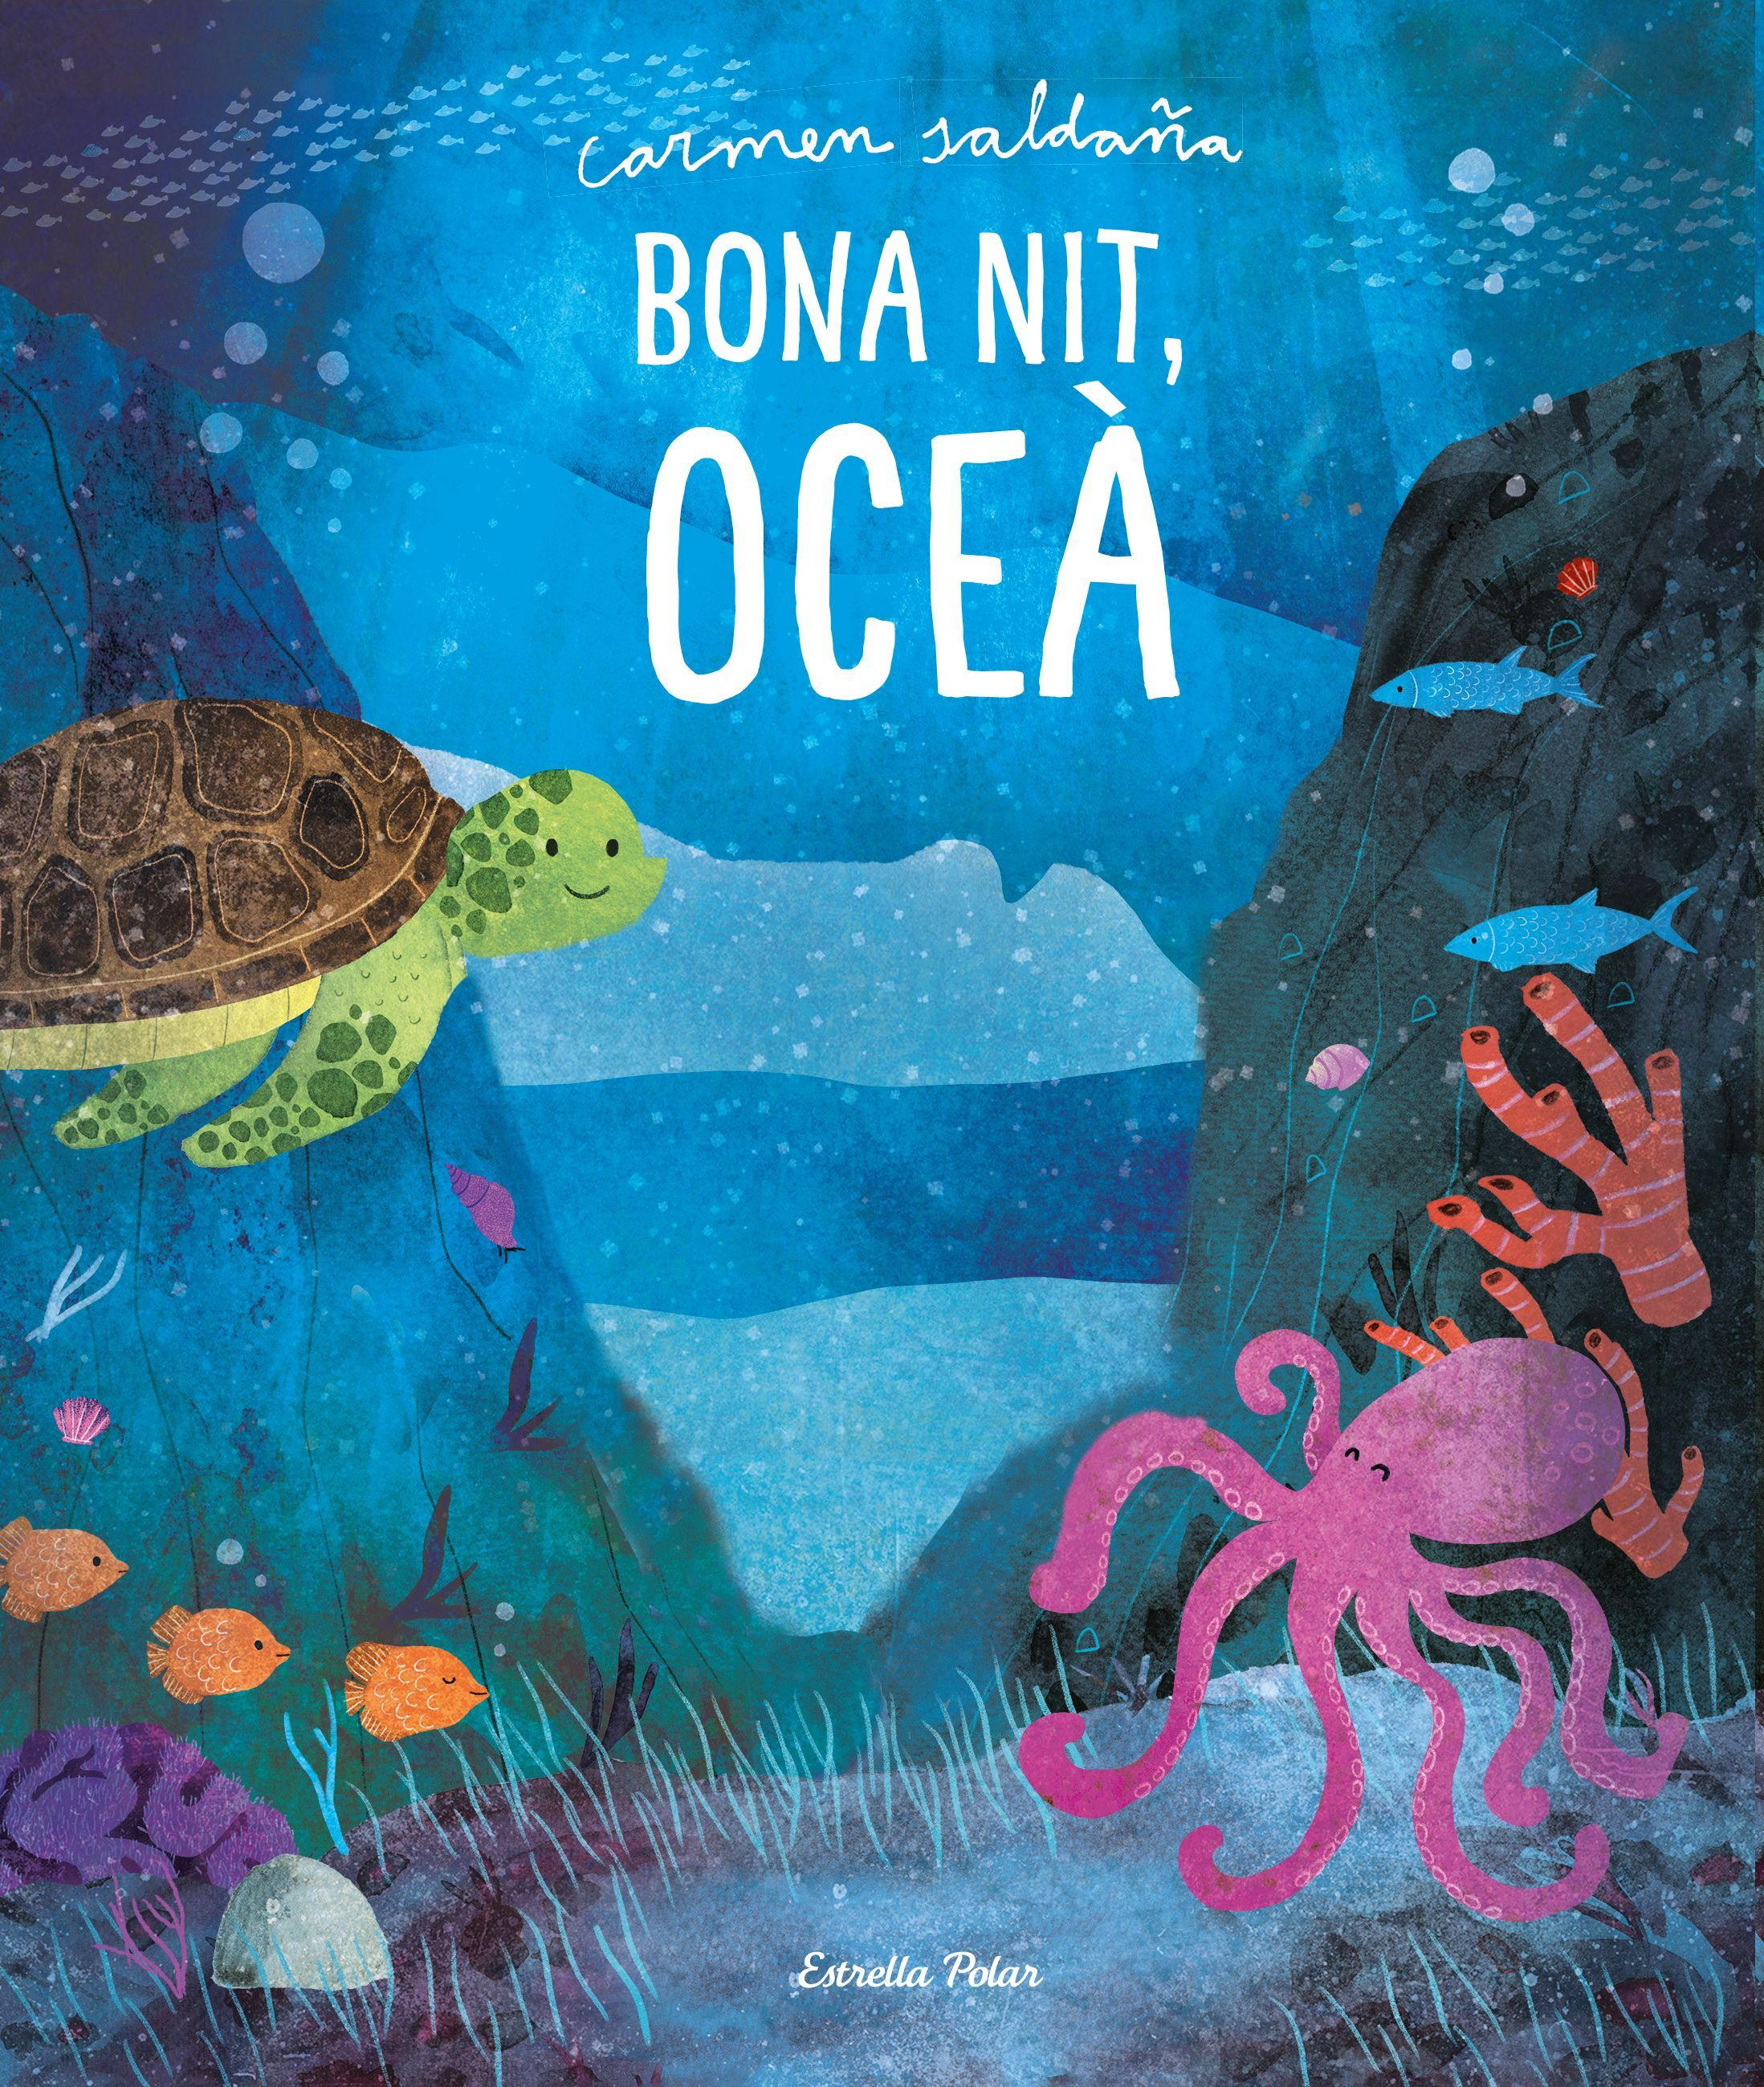 BONA NIT OCEA